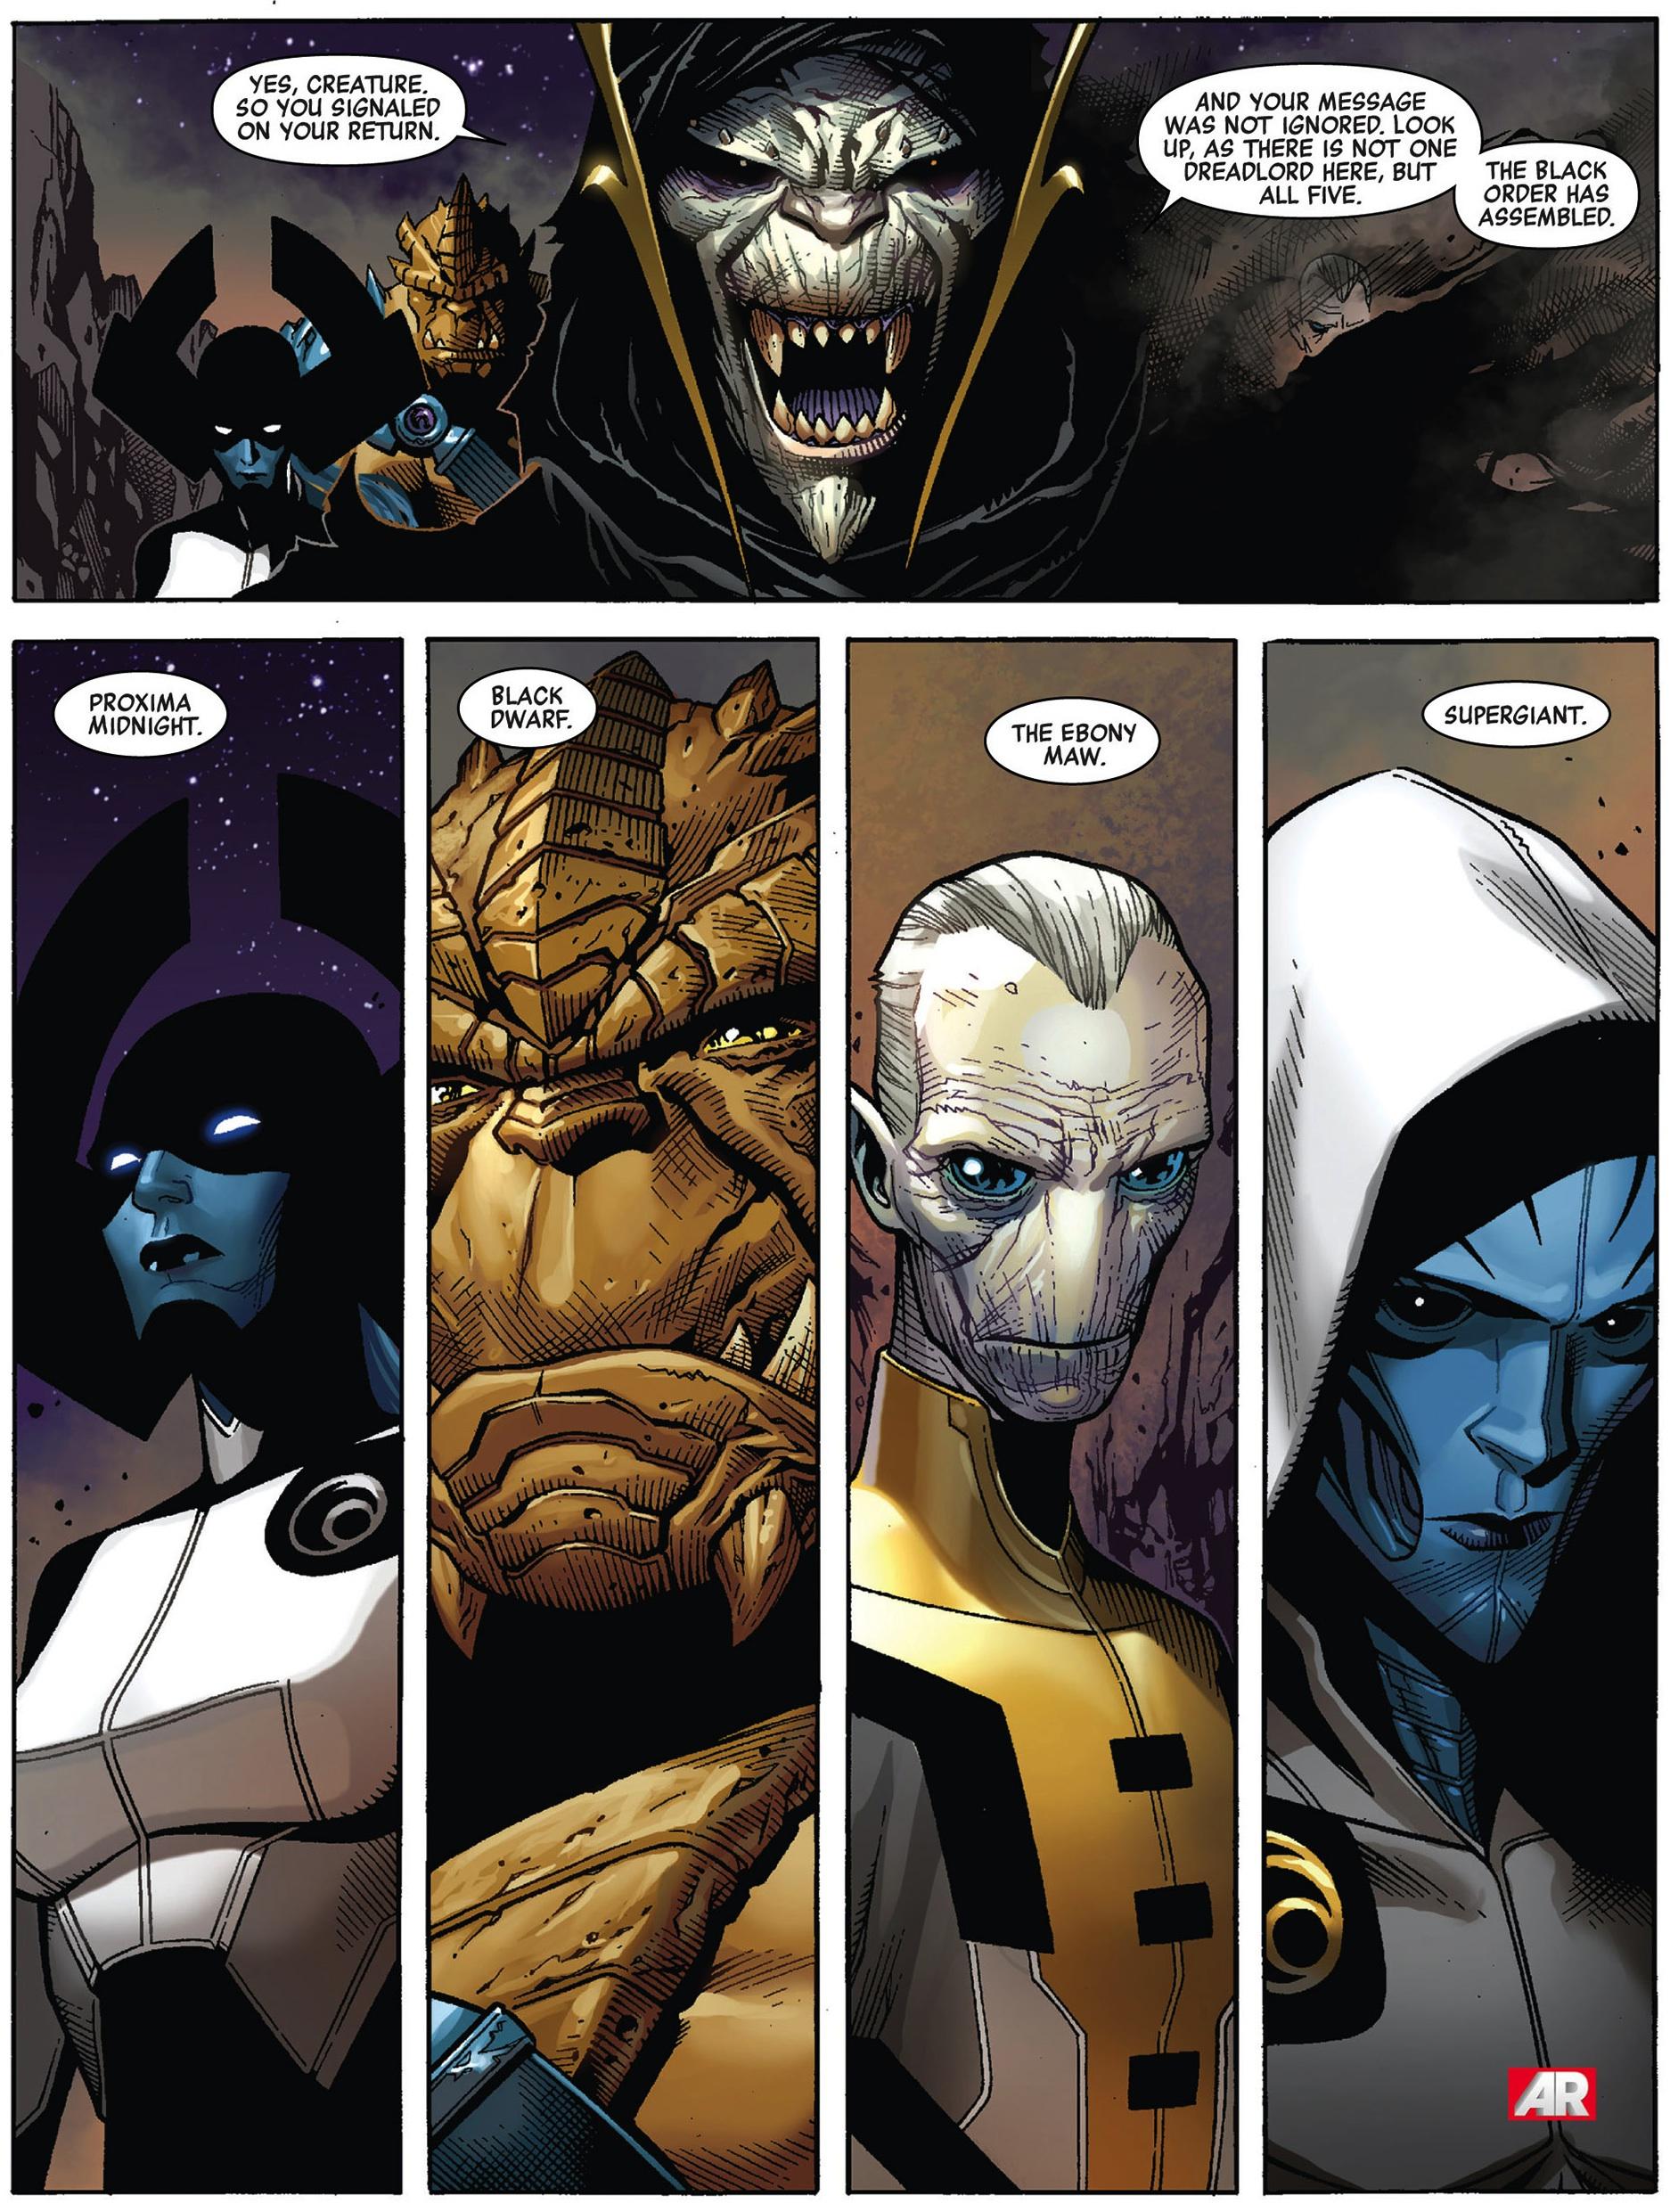 The New Avengers (Vol. 3) #8